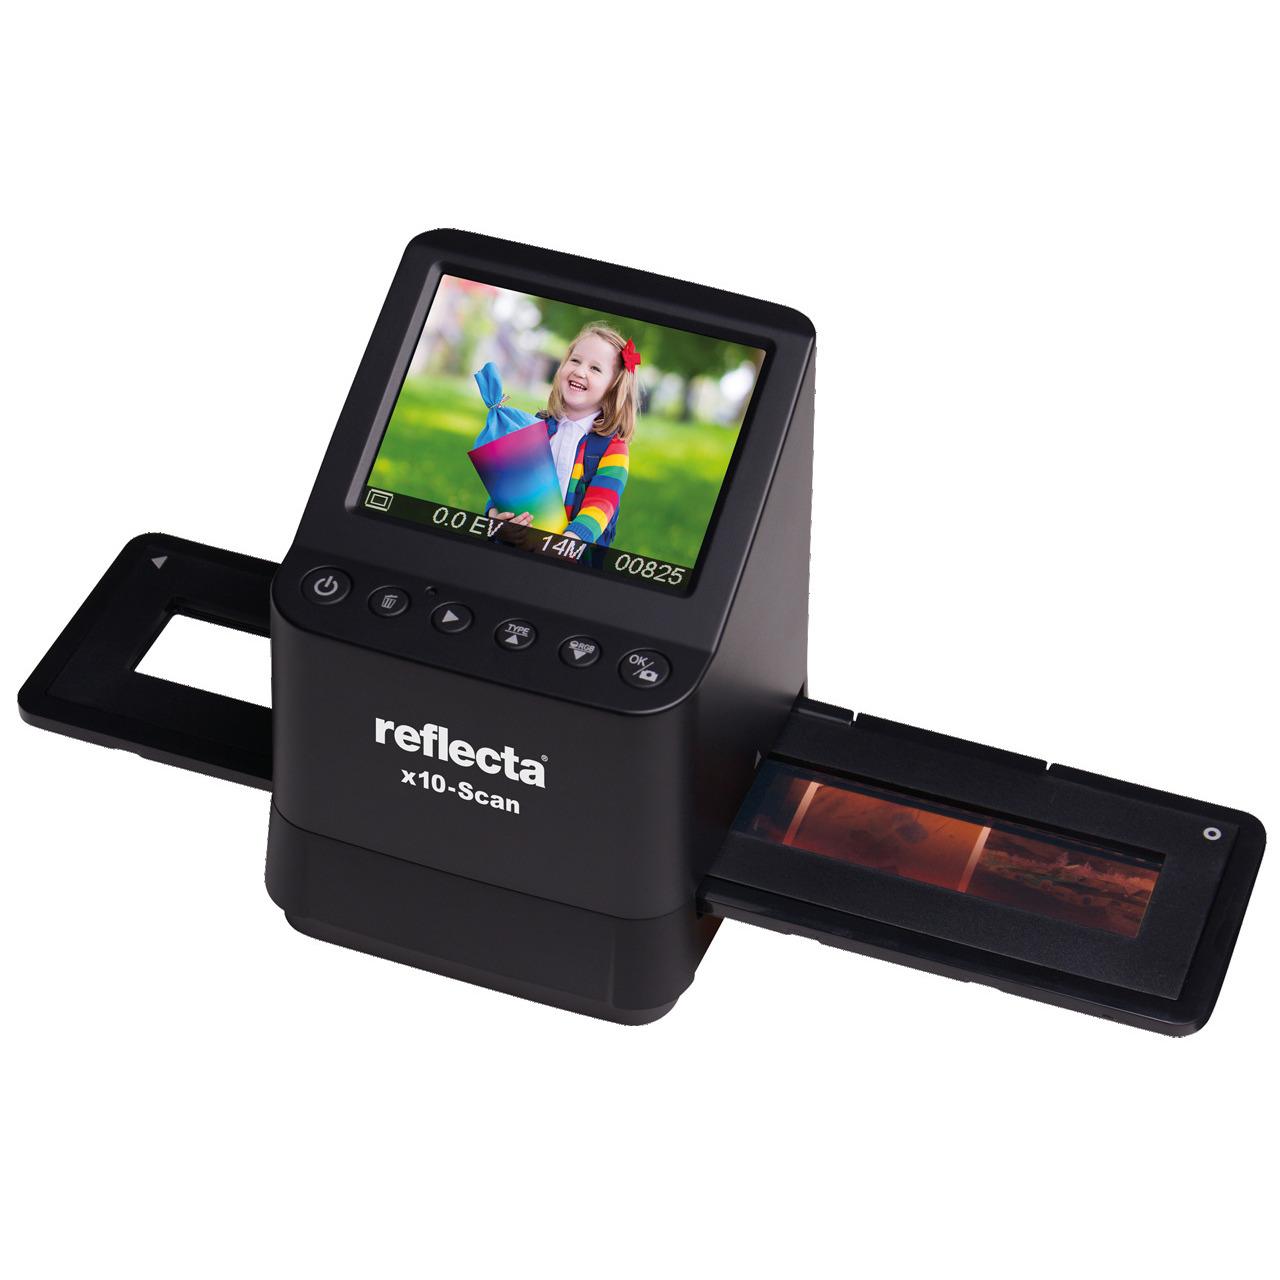 reflecta Dia-Negativscanner x10-Scan- 14 Megapixel- Vorschaudisplay 8-9 cm (3-5)- RGB-Farbanpasung